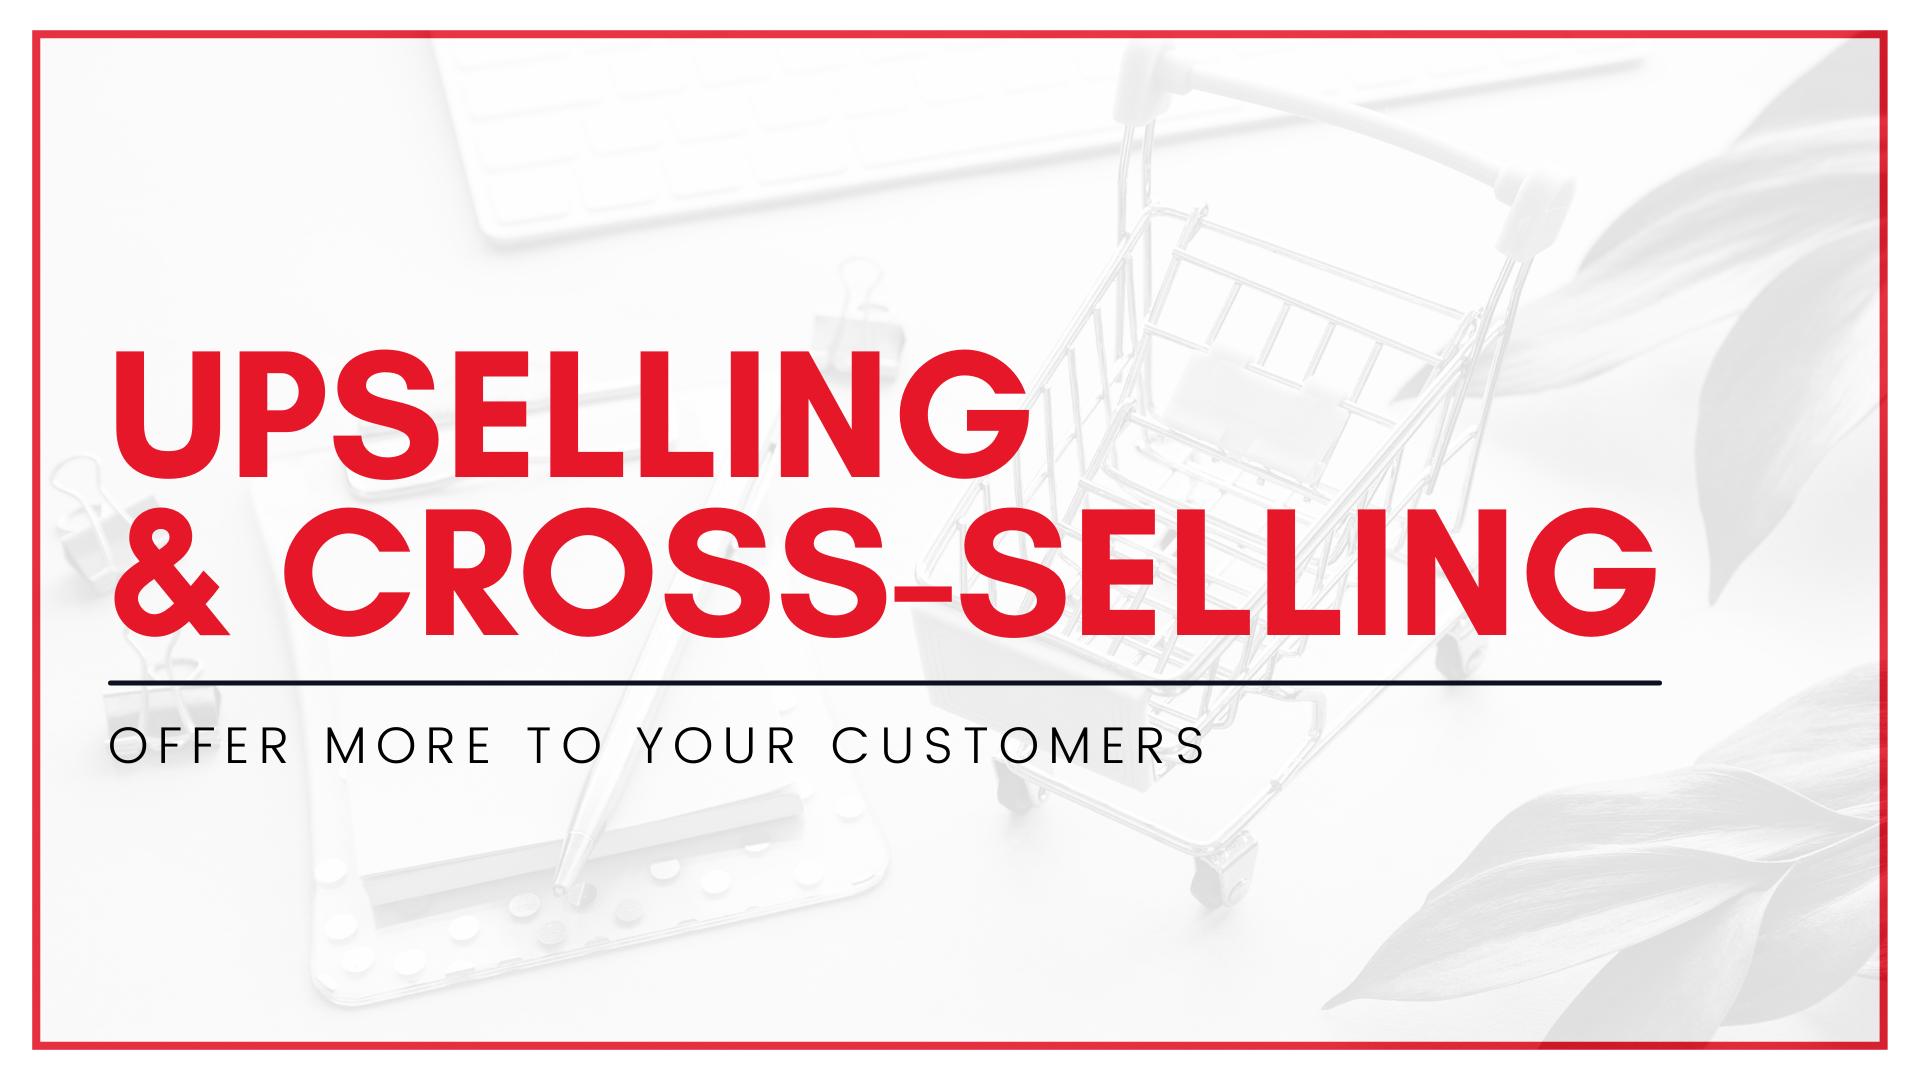 upselling, cross-selling, cross selling, upsell, cross sell, cross-sell, small business, online store, ecommerce strategy, business strategy, upselling and cross-selling, small business strategy, startup strategy, ecommerce strategy